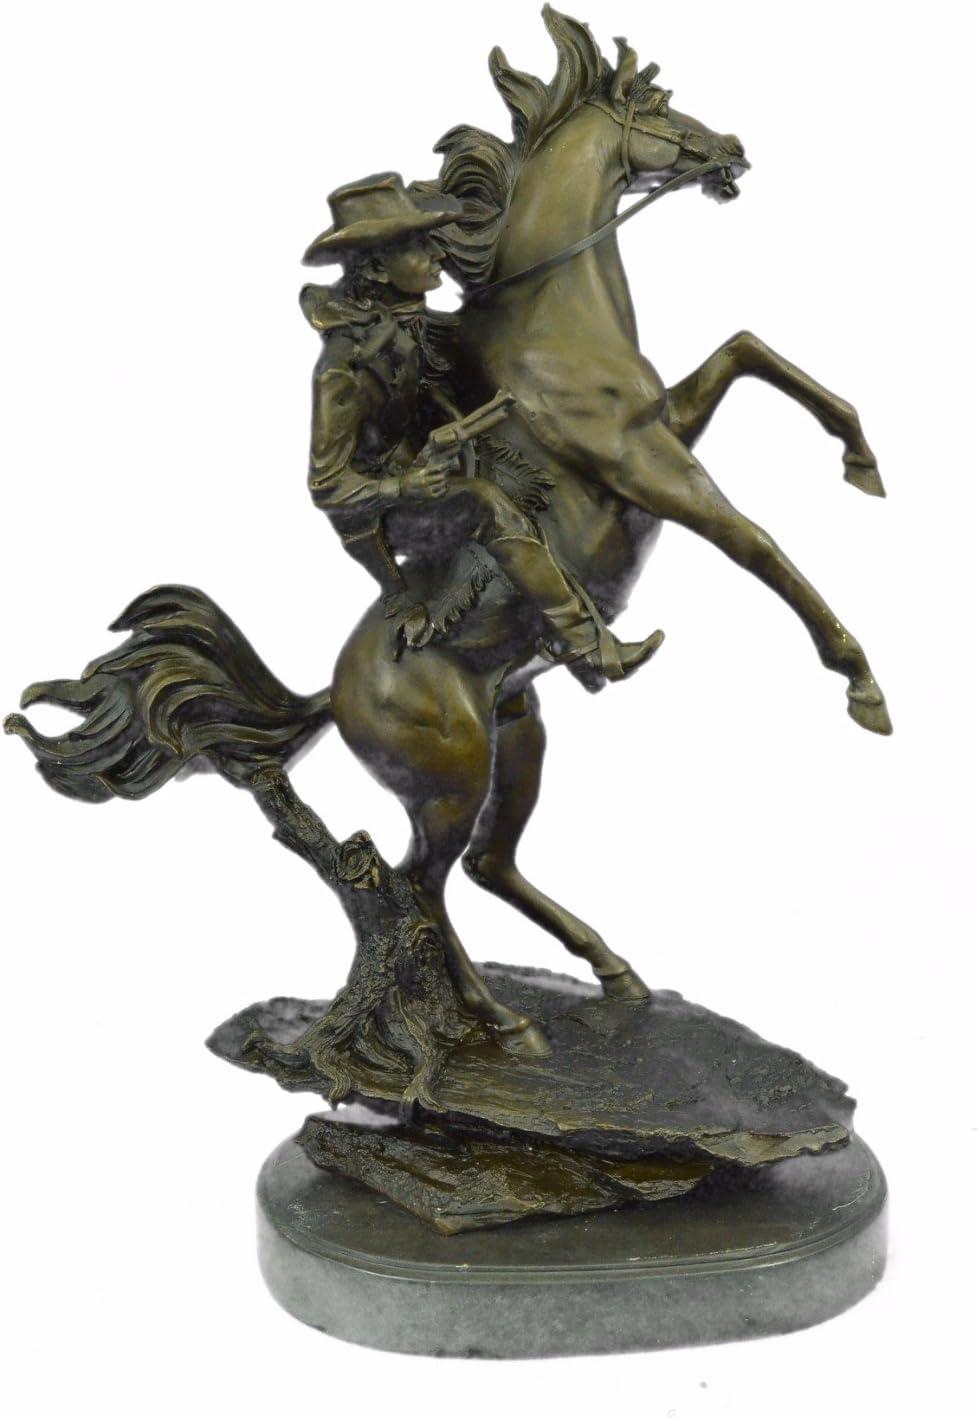 Rearing Horse Wildlife Statue Sculpture Figurine Ships Immediately JFSM INC